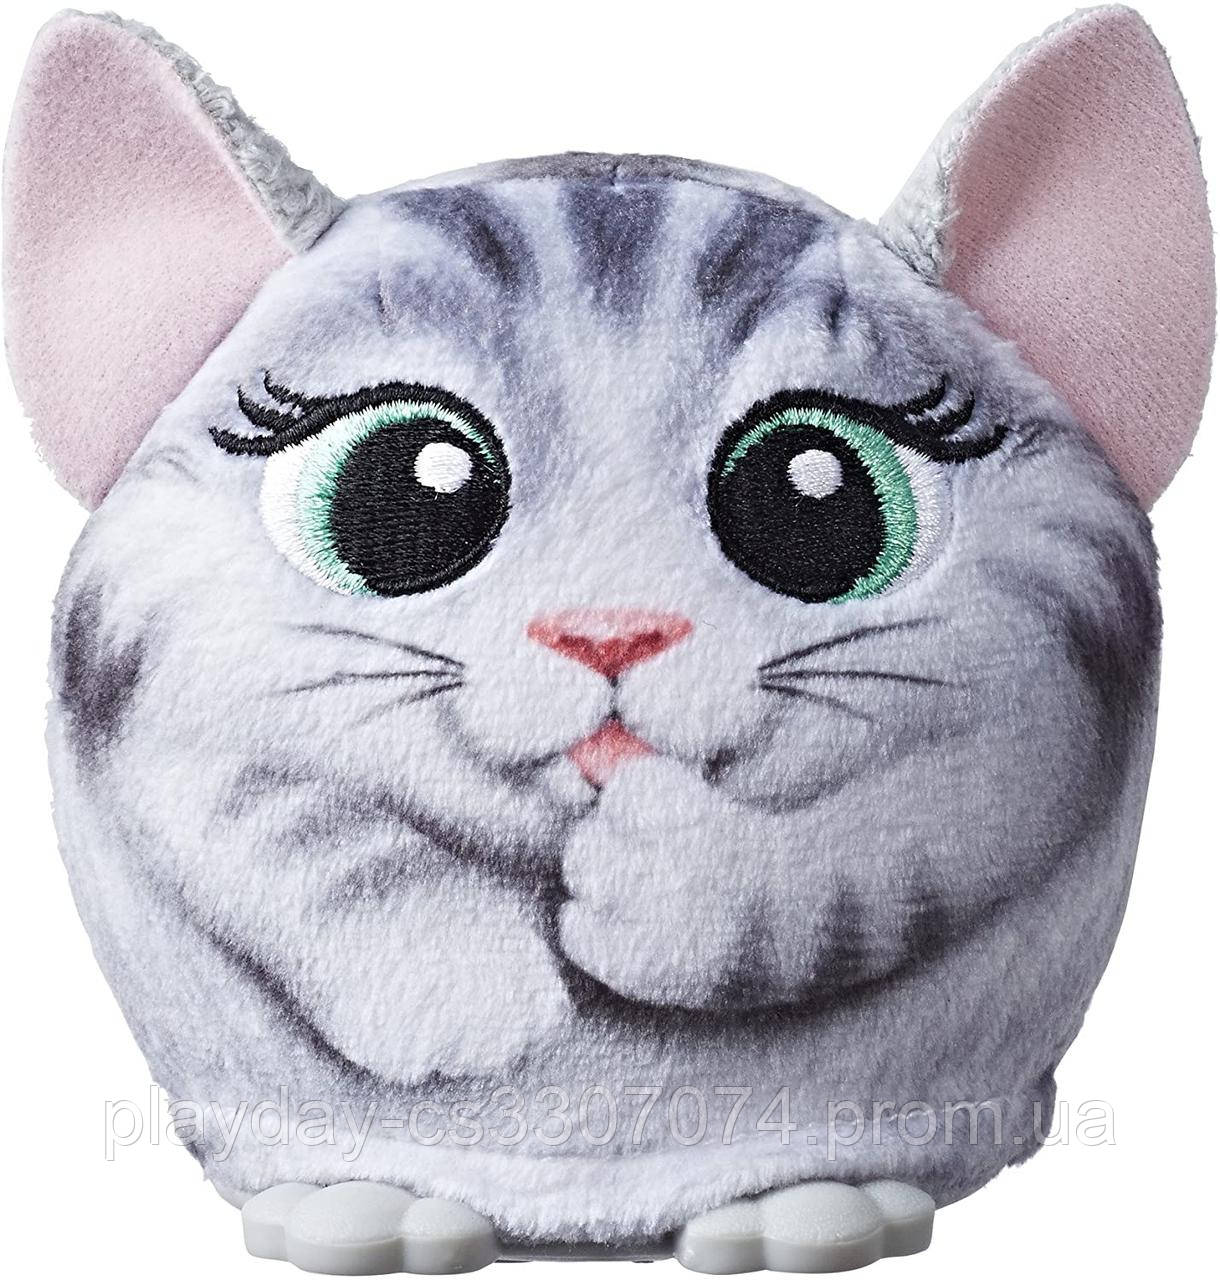 Интерактивный питомец Furreal cuties Husbro Котик